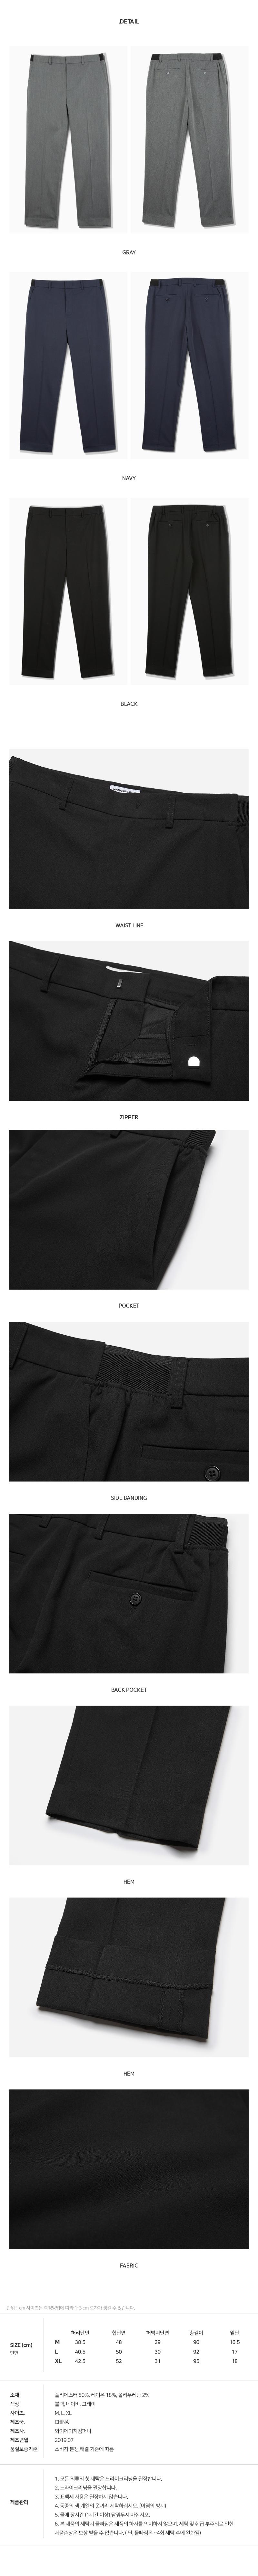 [minimal project] 미니멀프로젝트 스트레이트 슬랙스 MPT121 / 3color